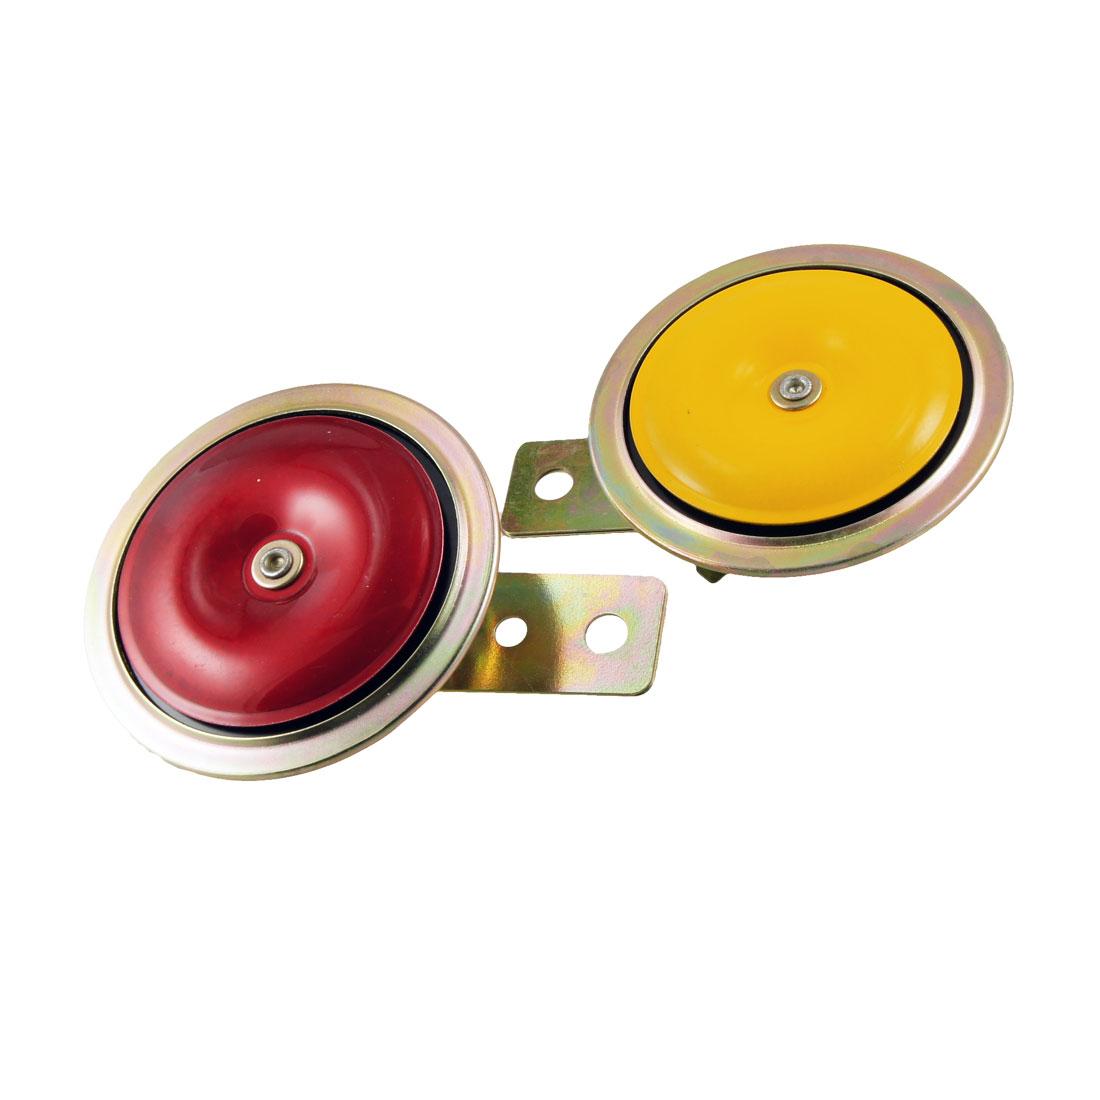 2 Pcs Red Yellow Metal DC 12V Sound Alarm Car Trumpet Speaker